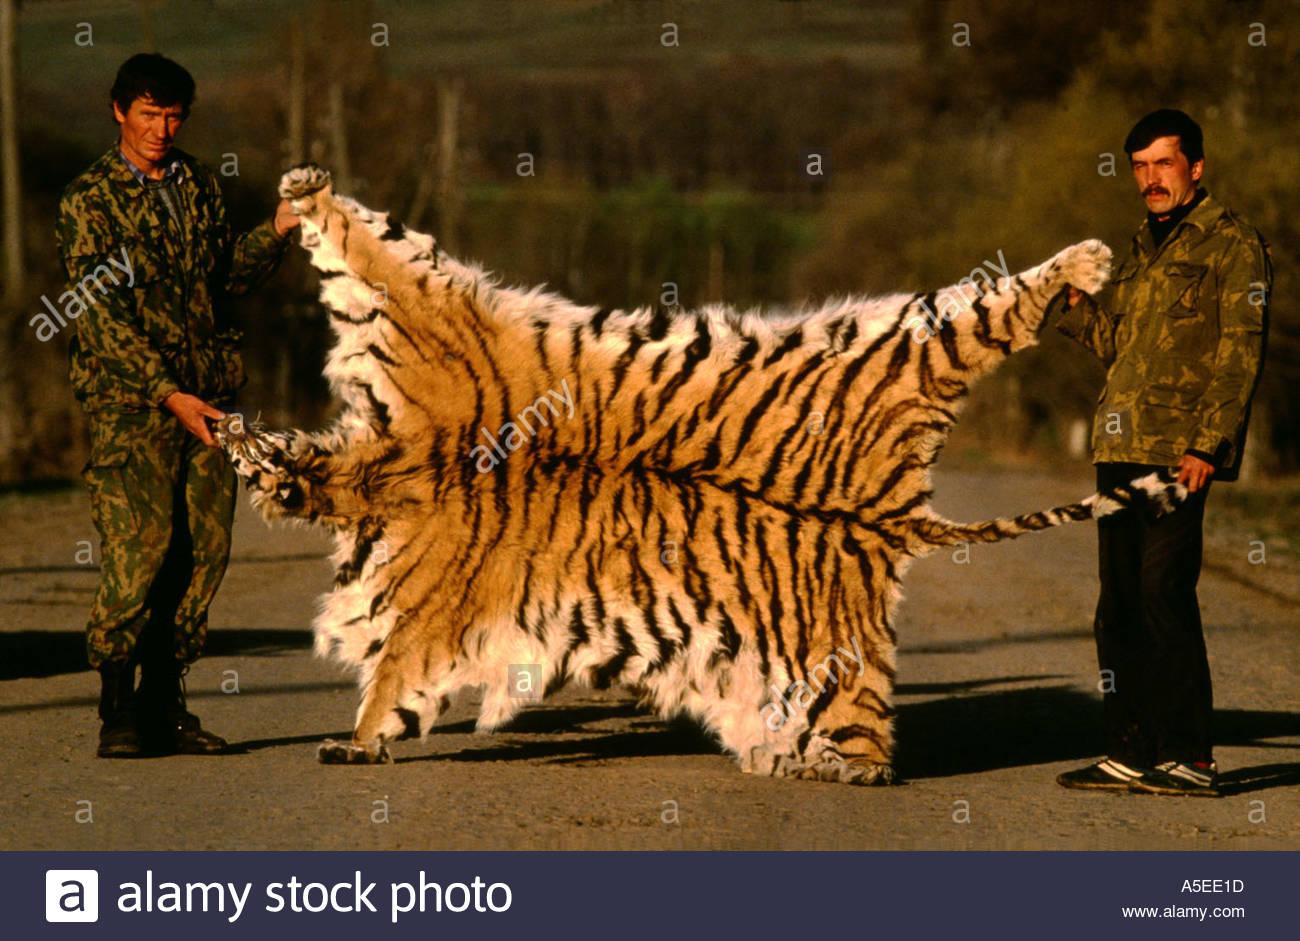 Siberian tigers poaching - photo#43